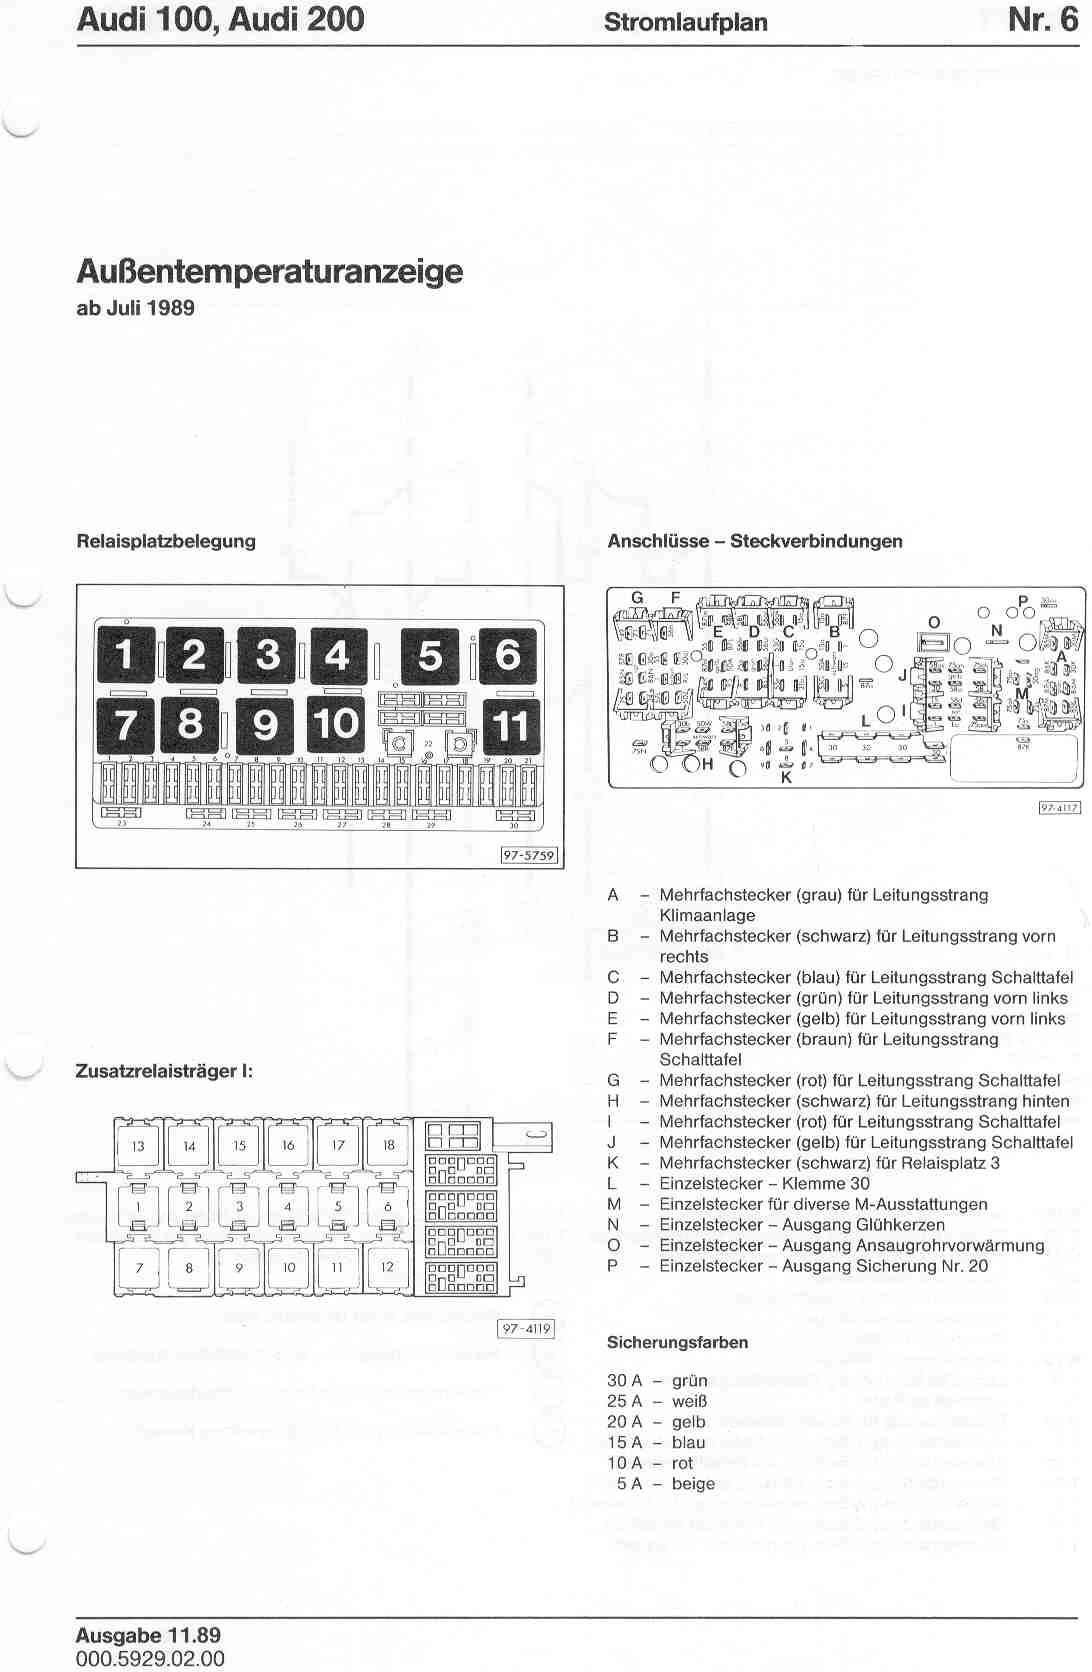 Audi 2 7 Wiring Diagram Schematics Diagrams A4 100 200 Factory Rh Sizov Org 1998 Fuse Box Location